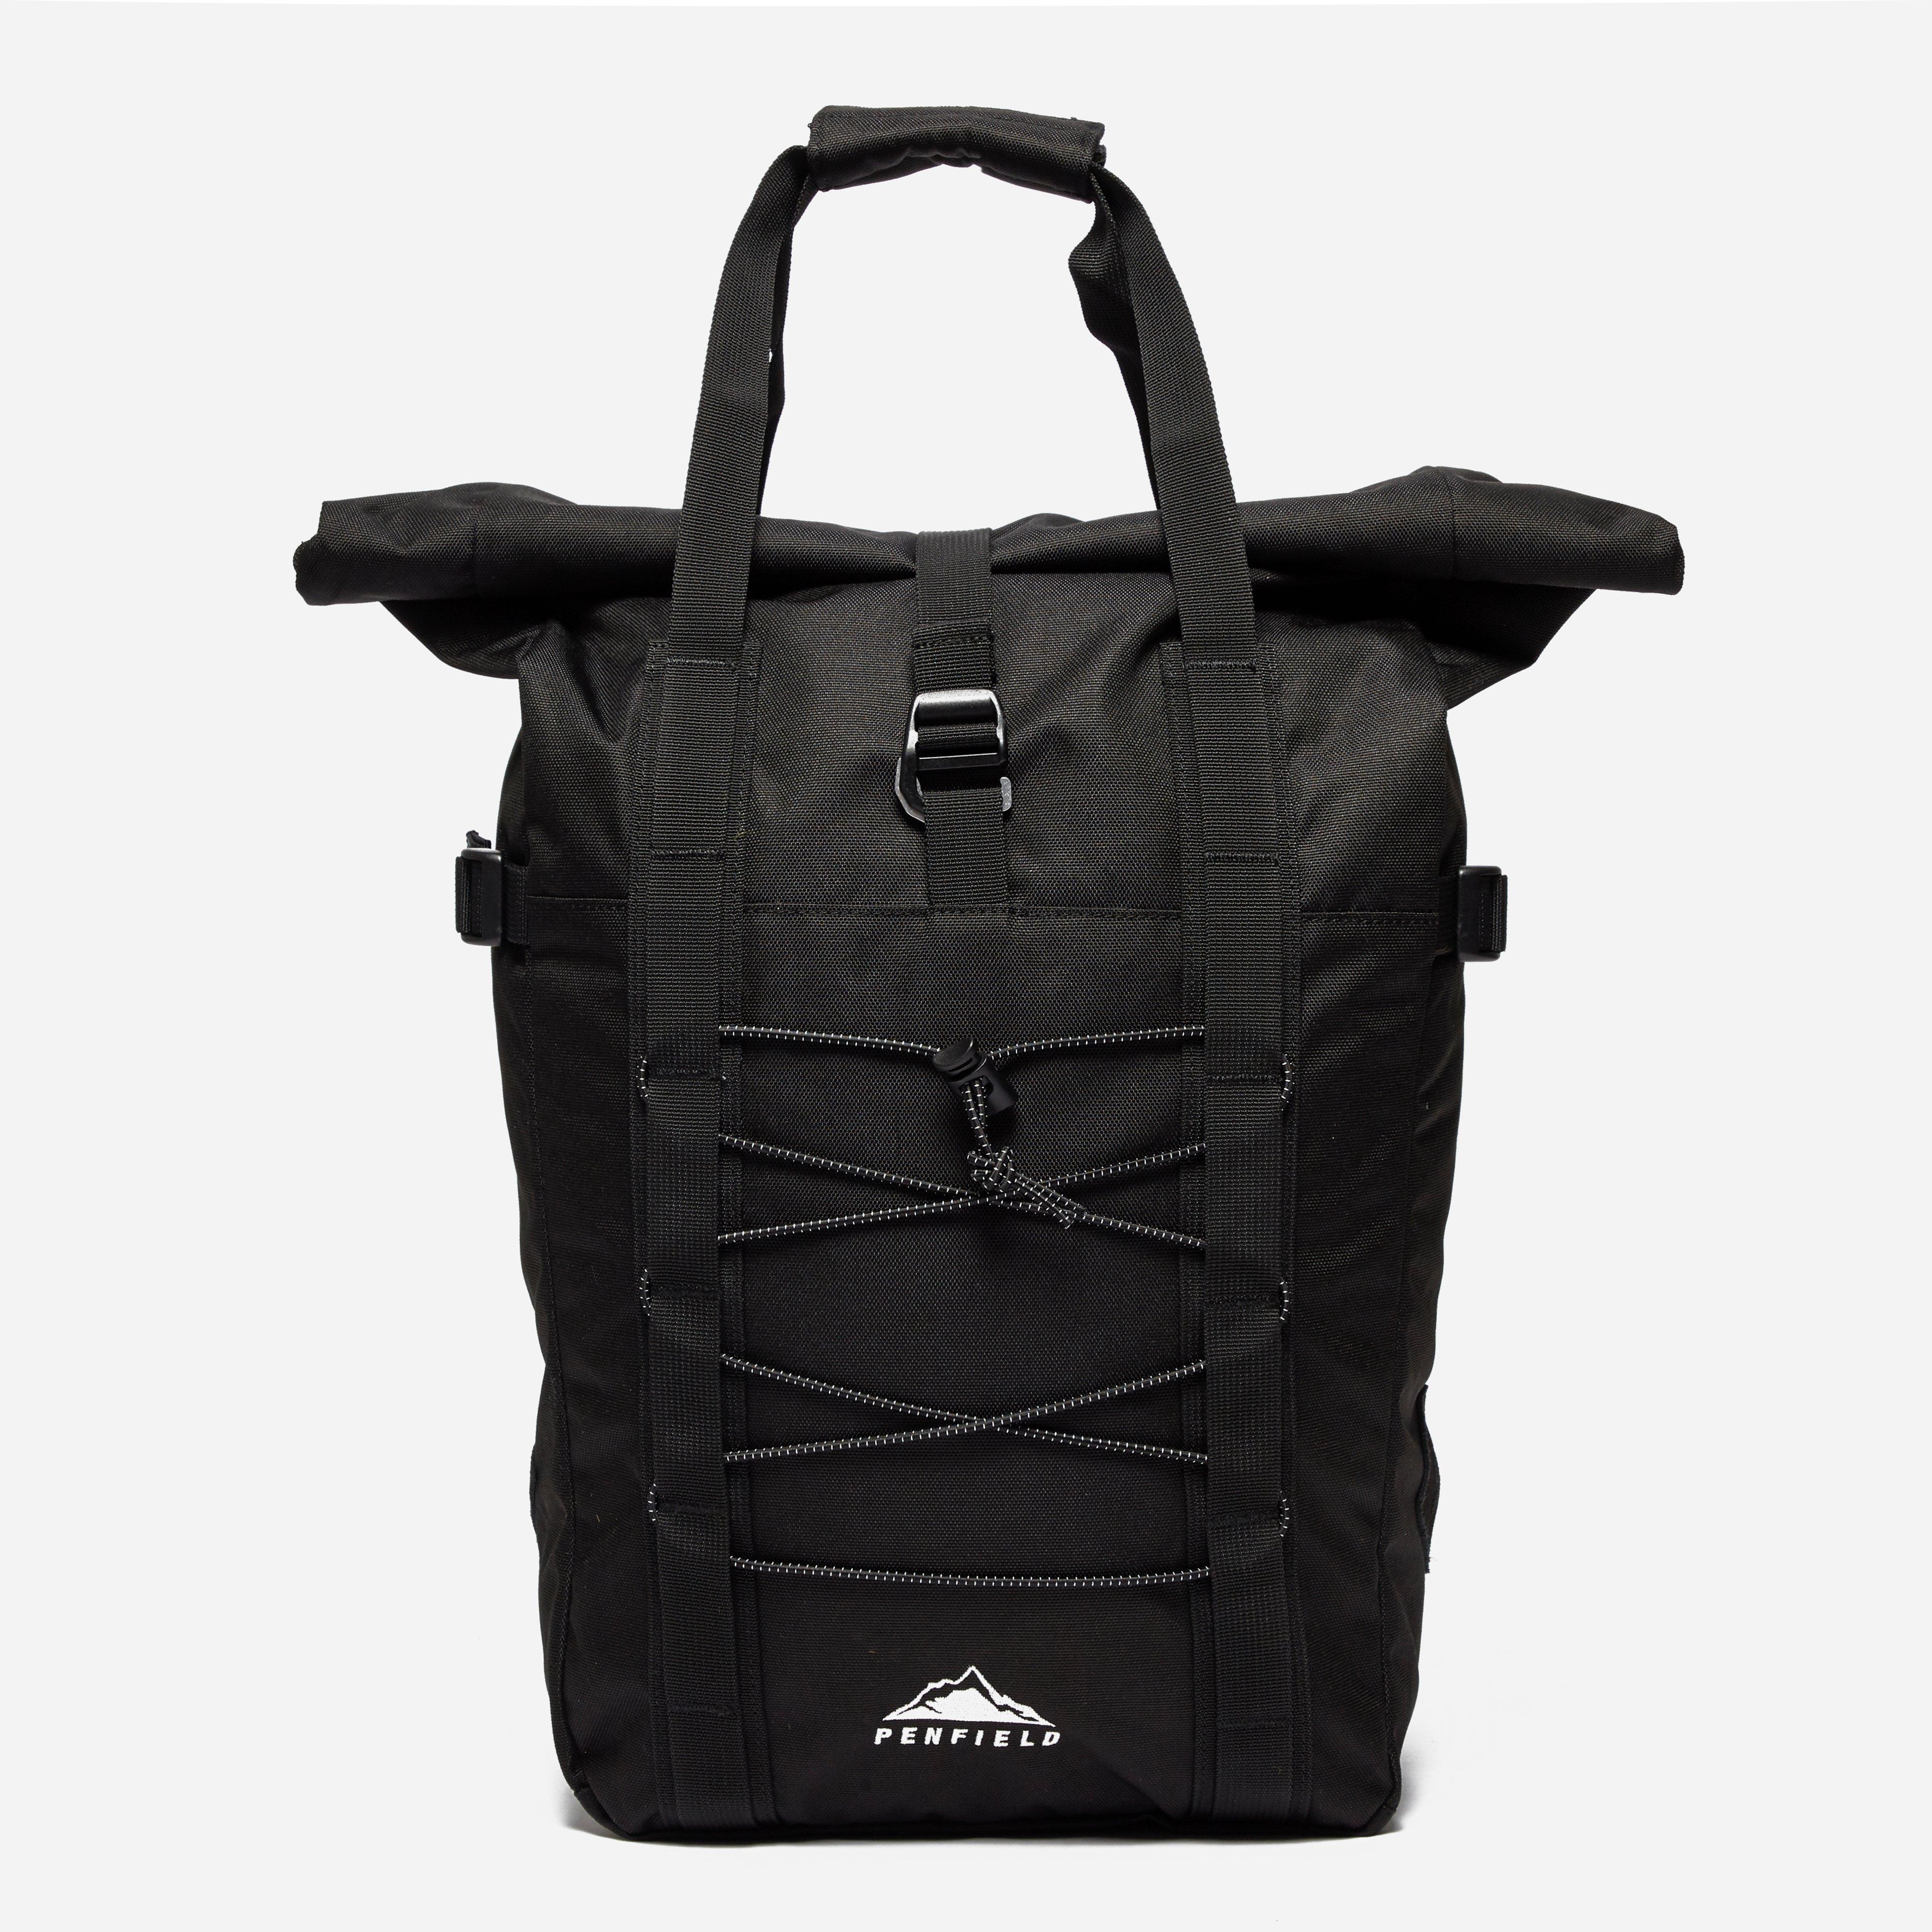 Penfield Mistral Tote Bag